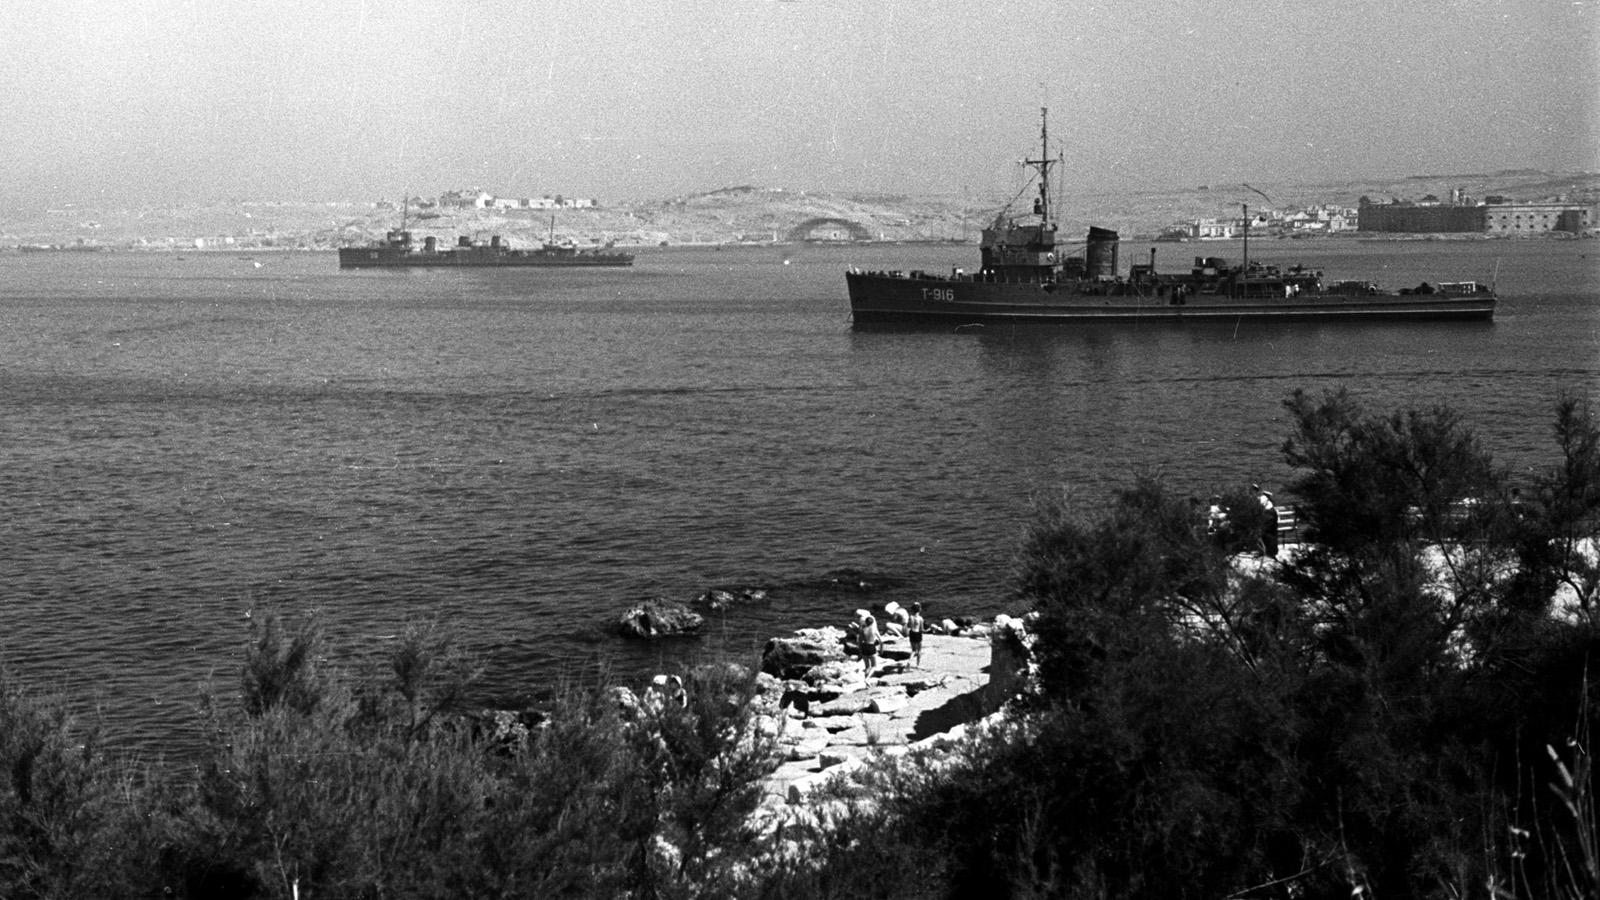 1954 год. Празднование Дня военно-морского флота в Севастополе